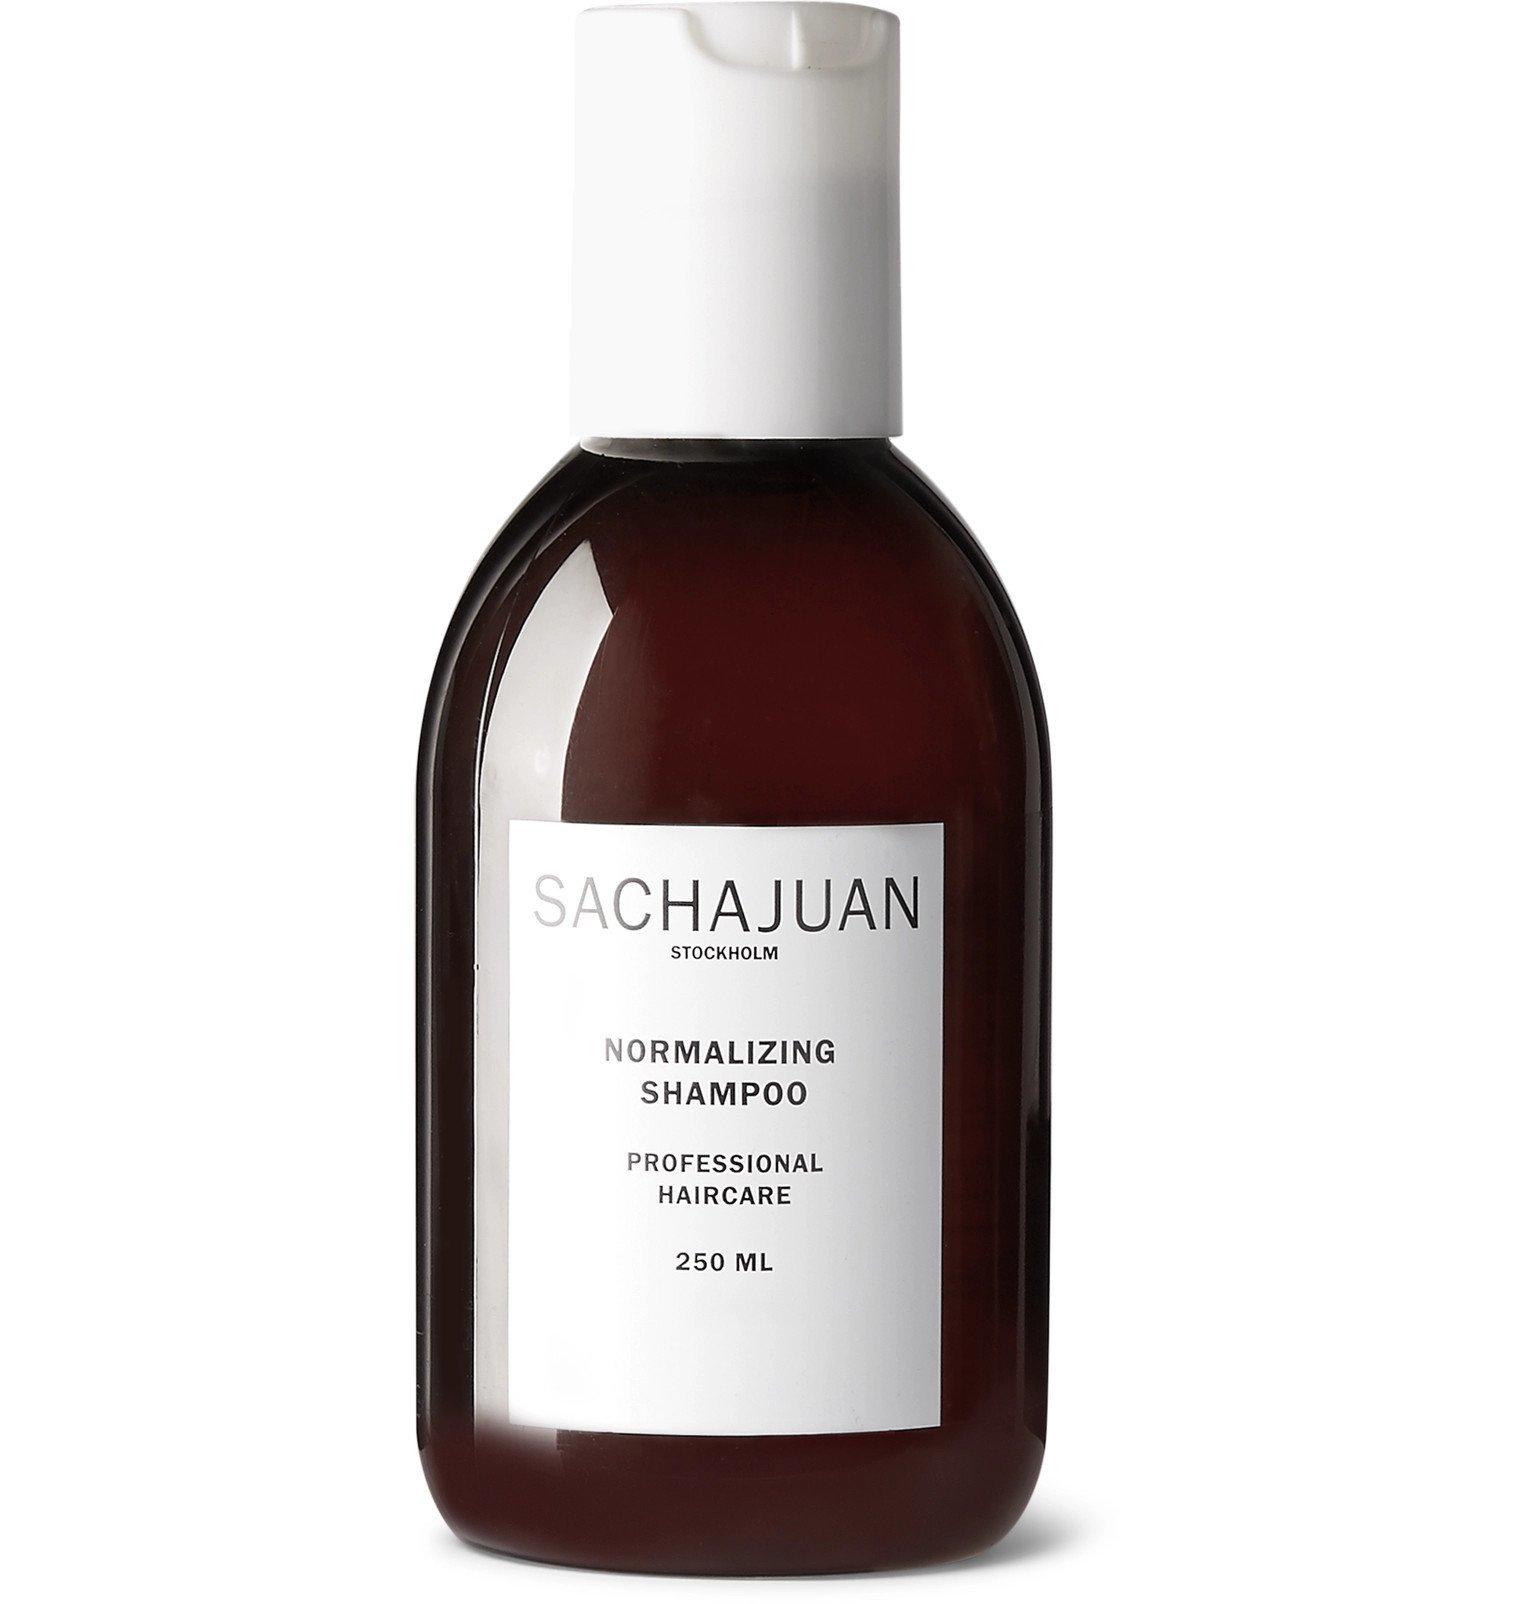 Photo: SACHAJUAN - Normalizing Shampoo, 250ml - Colorless